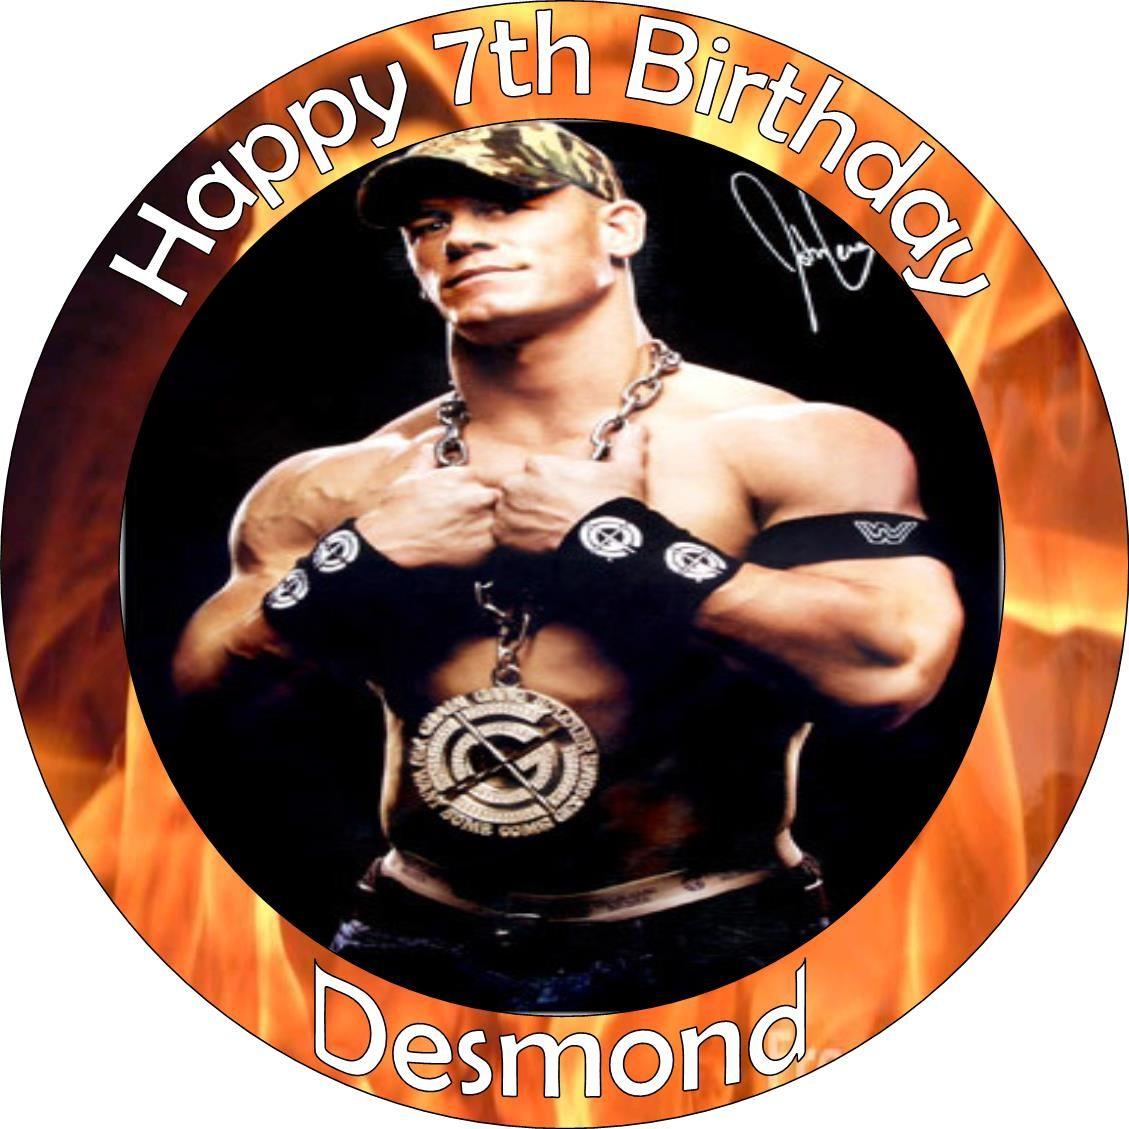 John Cena Cake Topper John Cena Cake Topper 250 Cake Topper